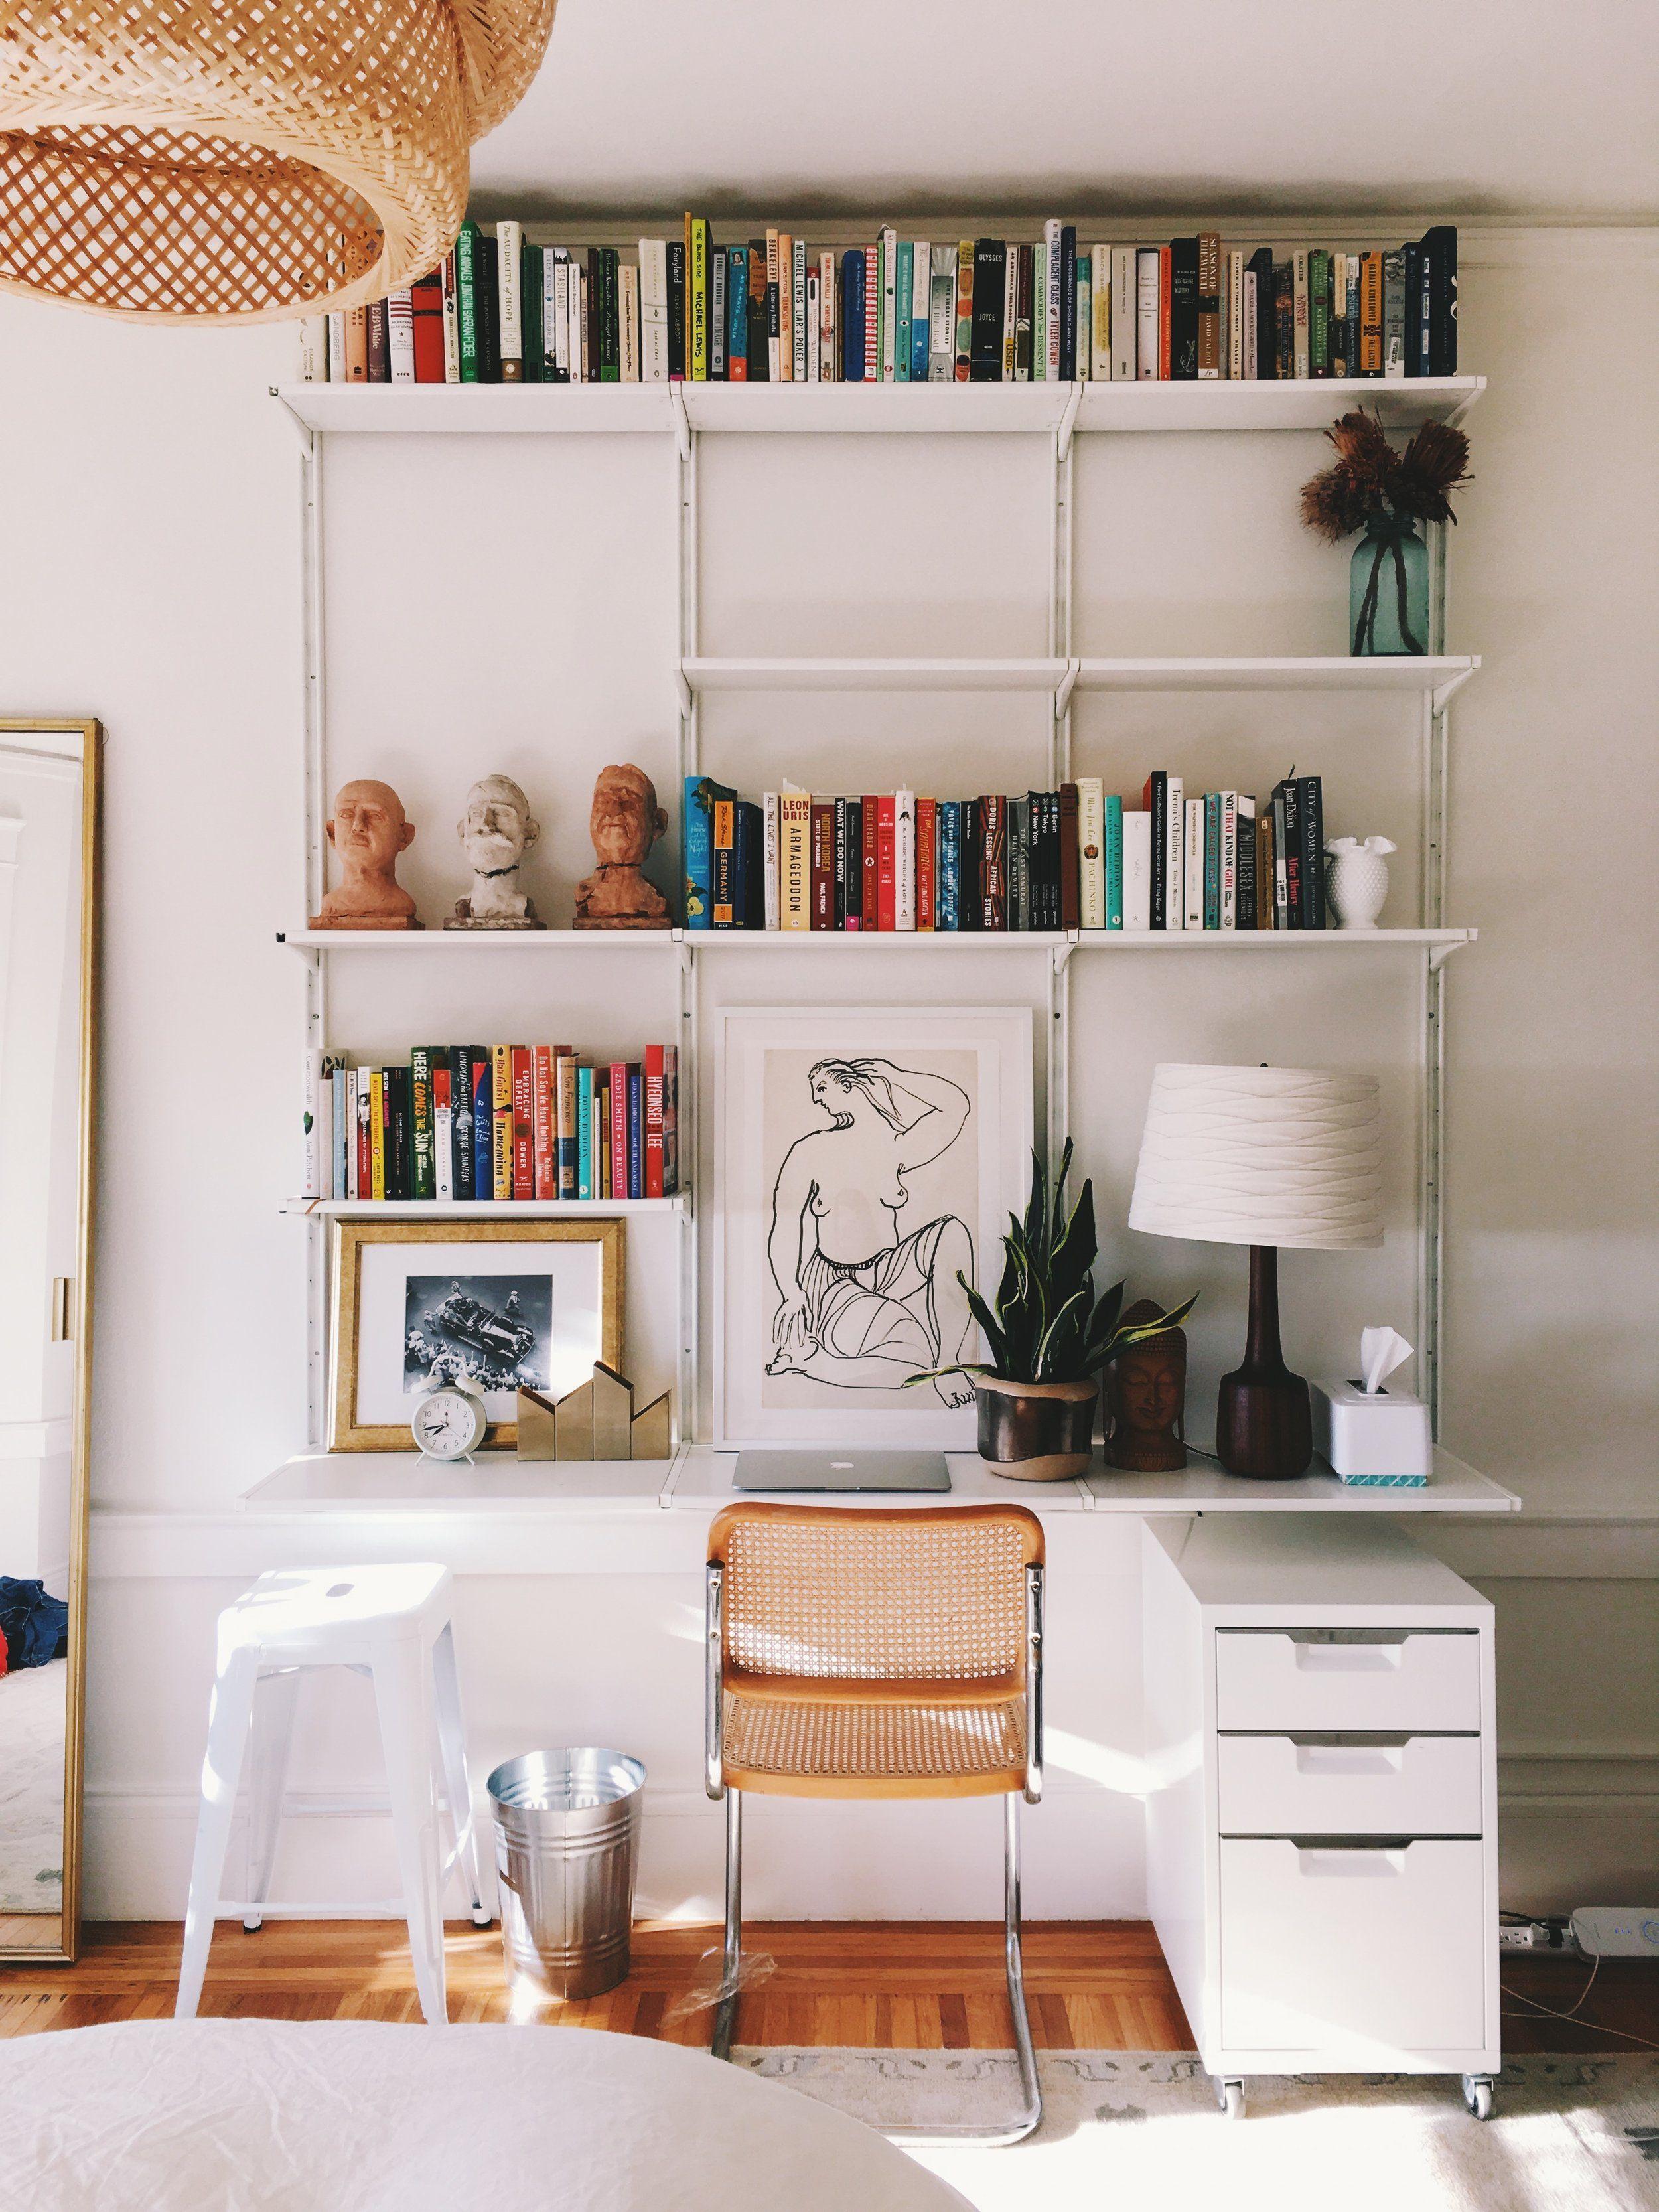 Épinglé sur Home Decor & Homes